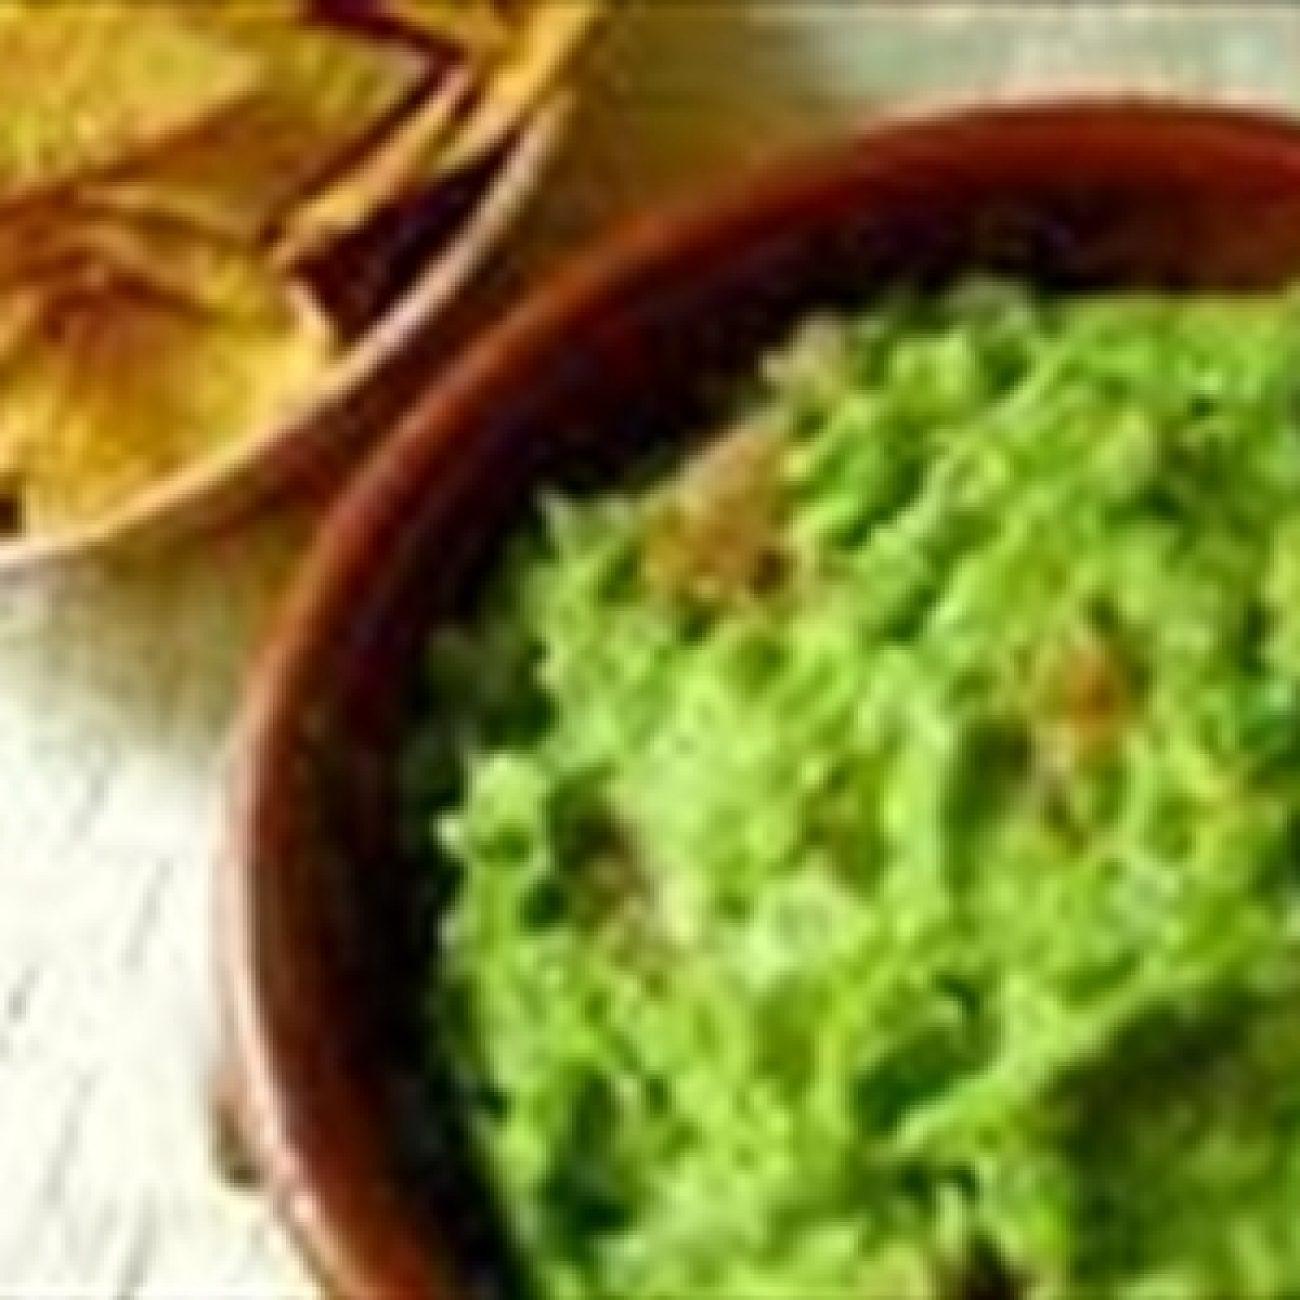 Appetizer – Guacamole